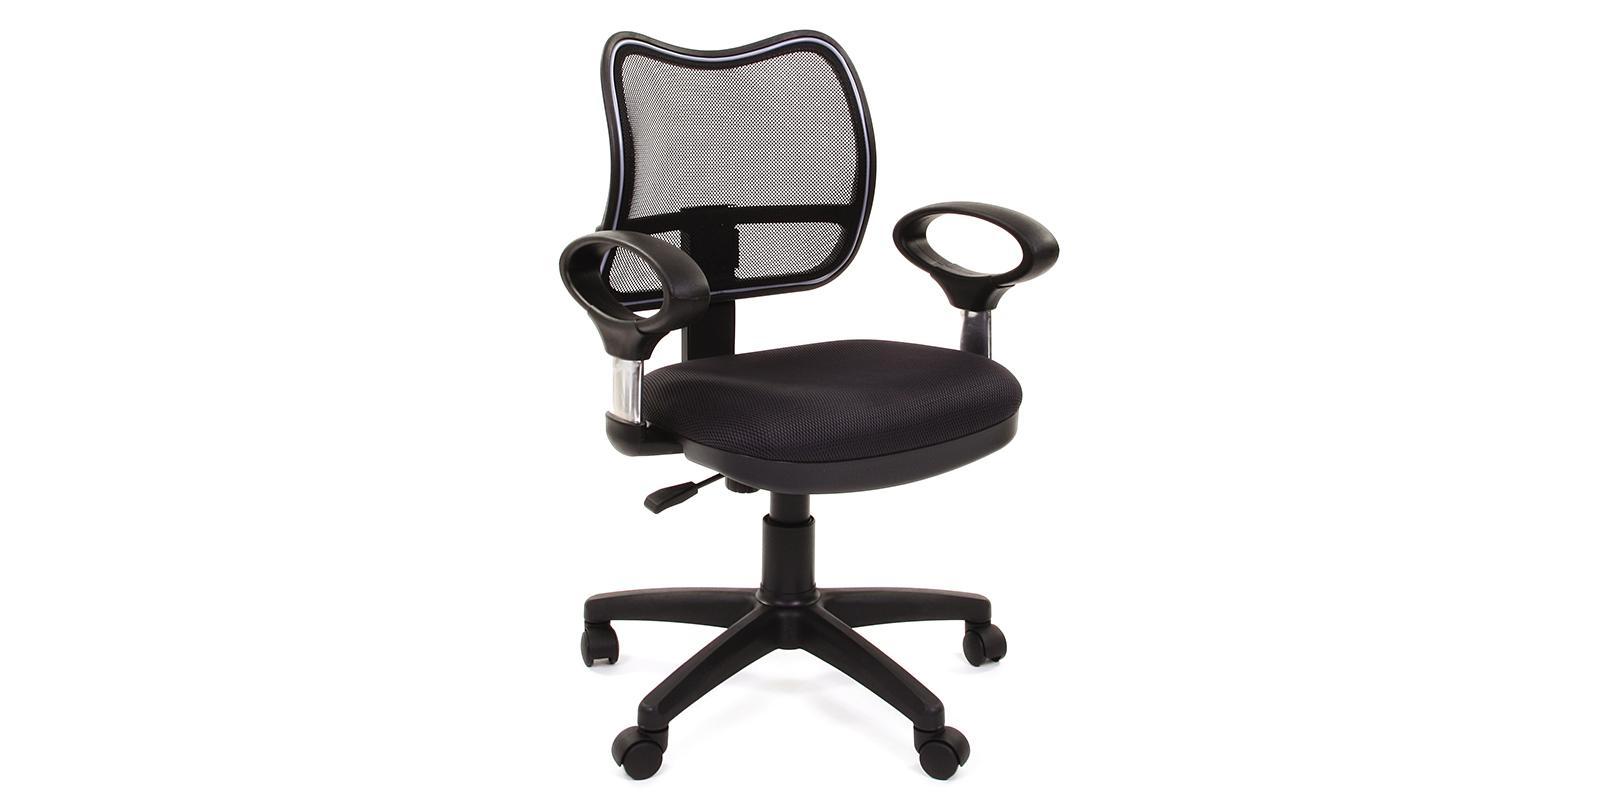 Игровое кресло HomeMe Chairman 450 от Homeme.ru